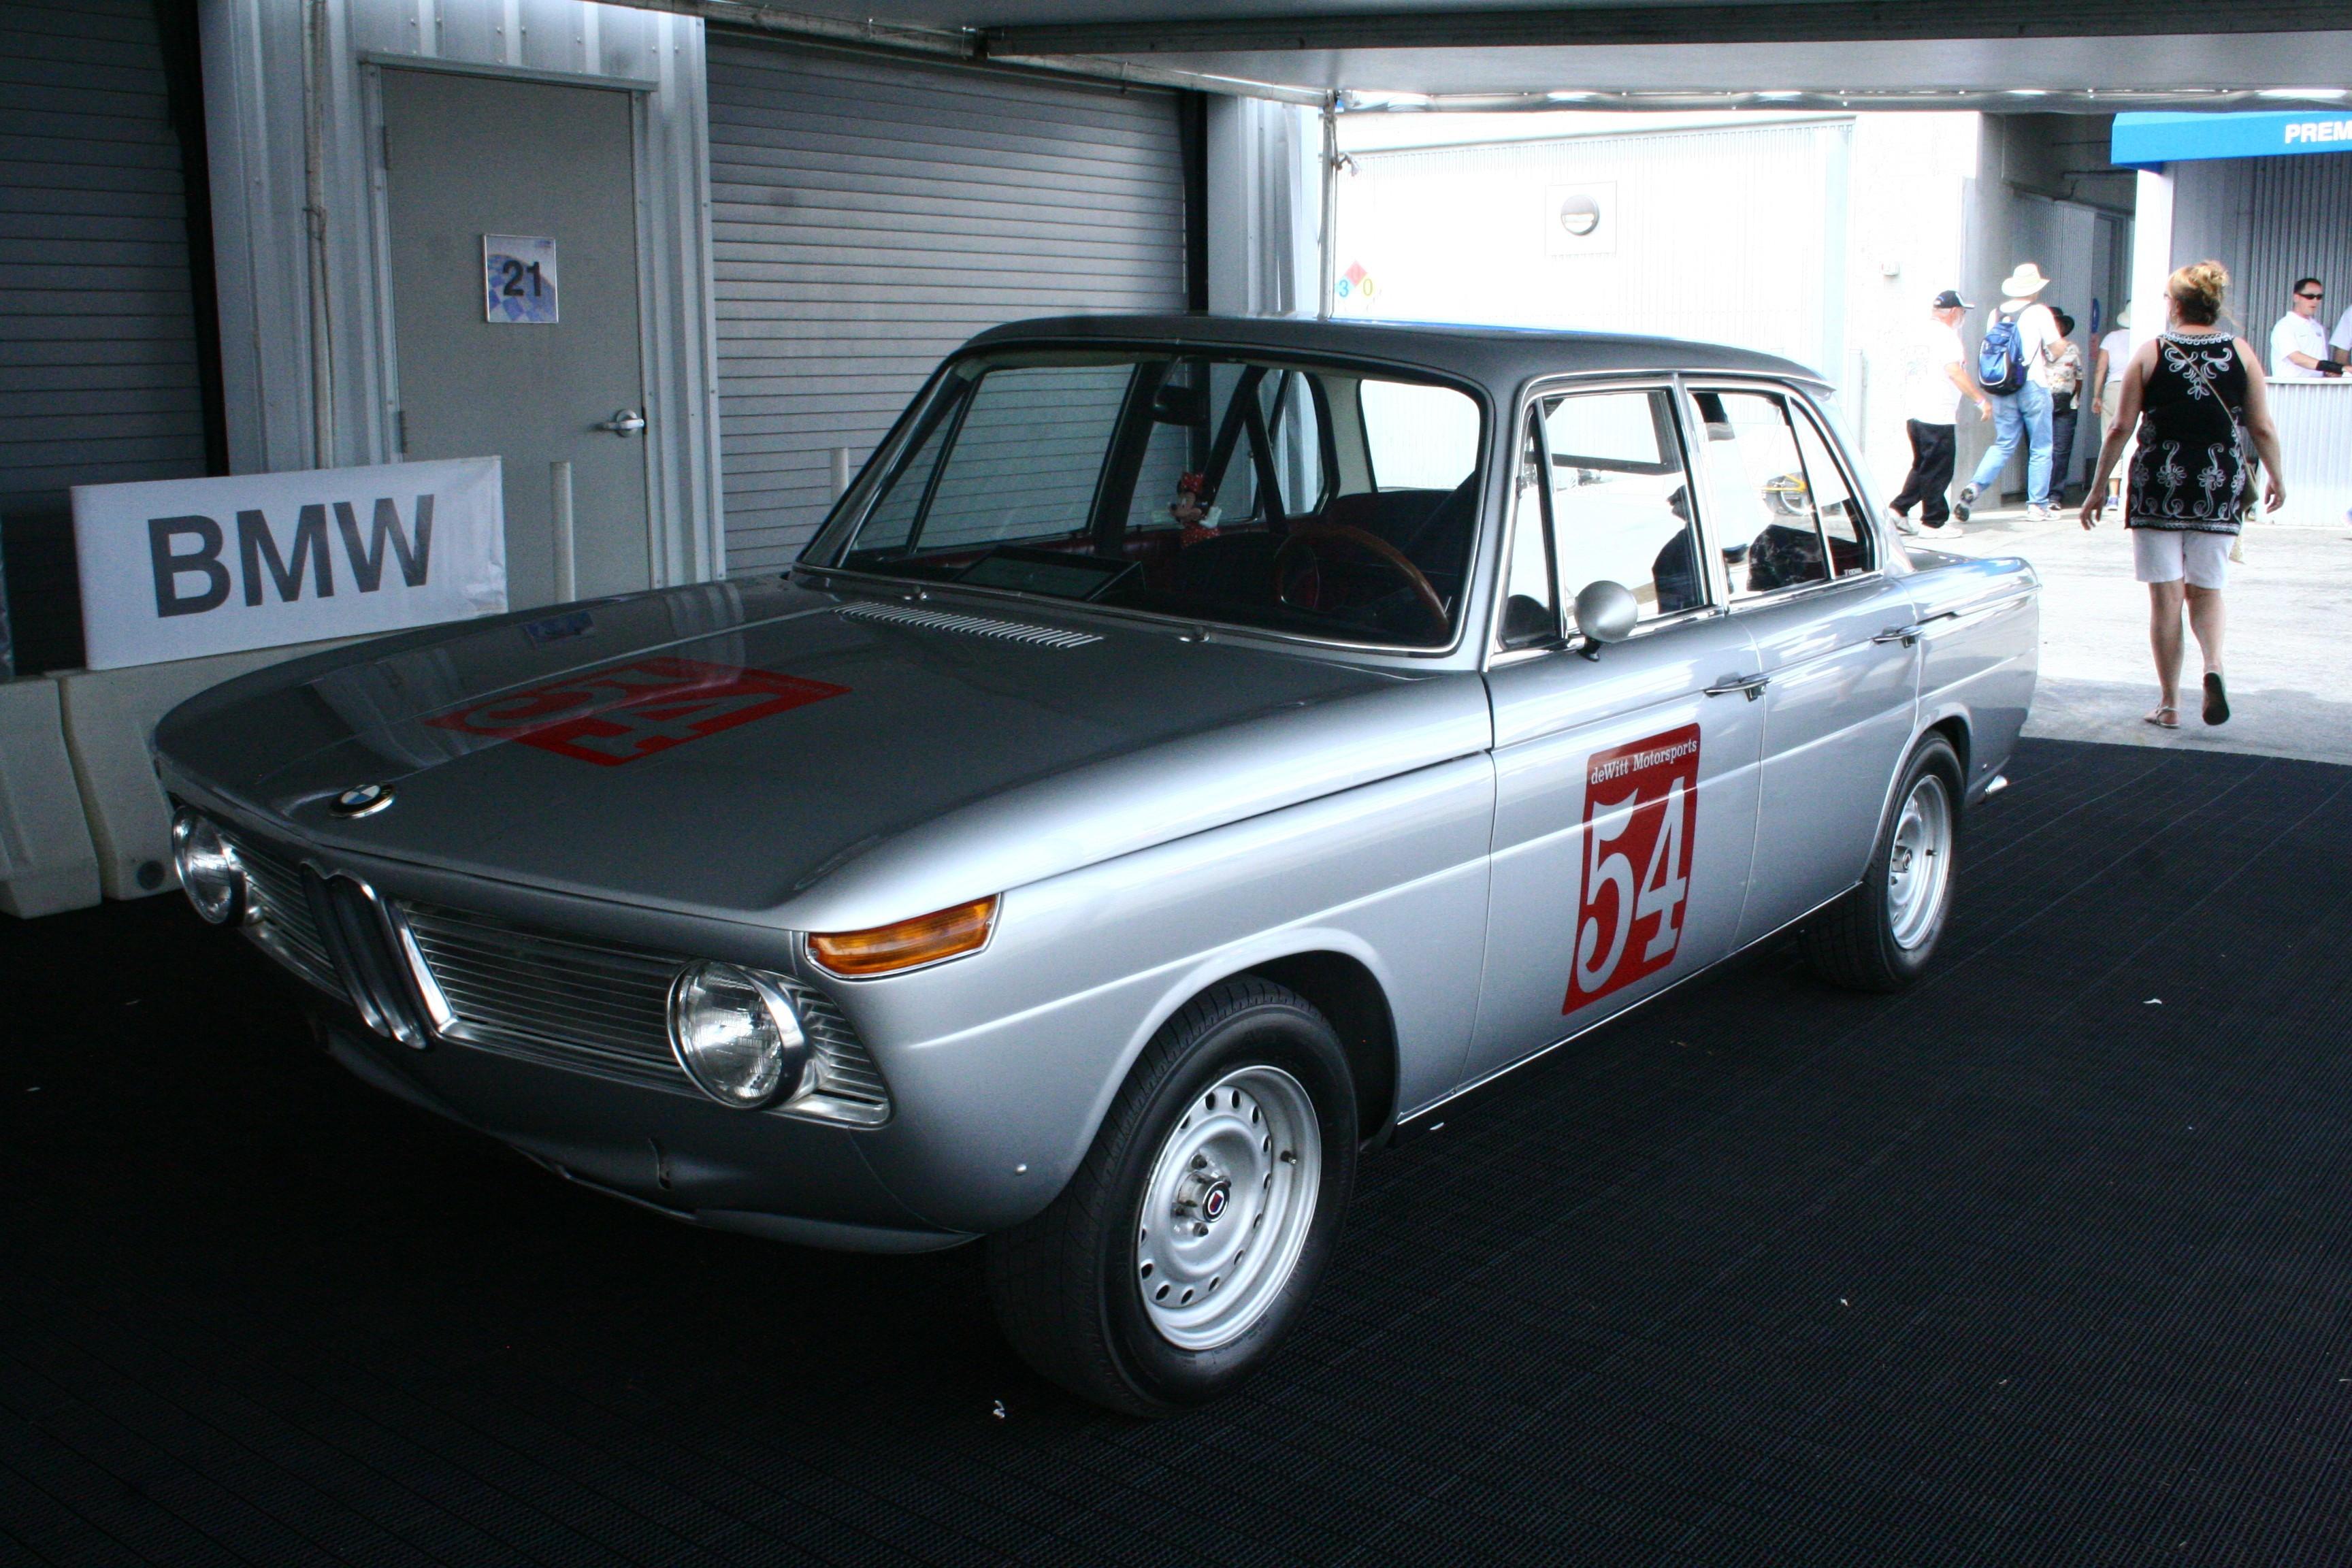 Wallpaper Bmw Classic Car Coupe Convertible Sedan